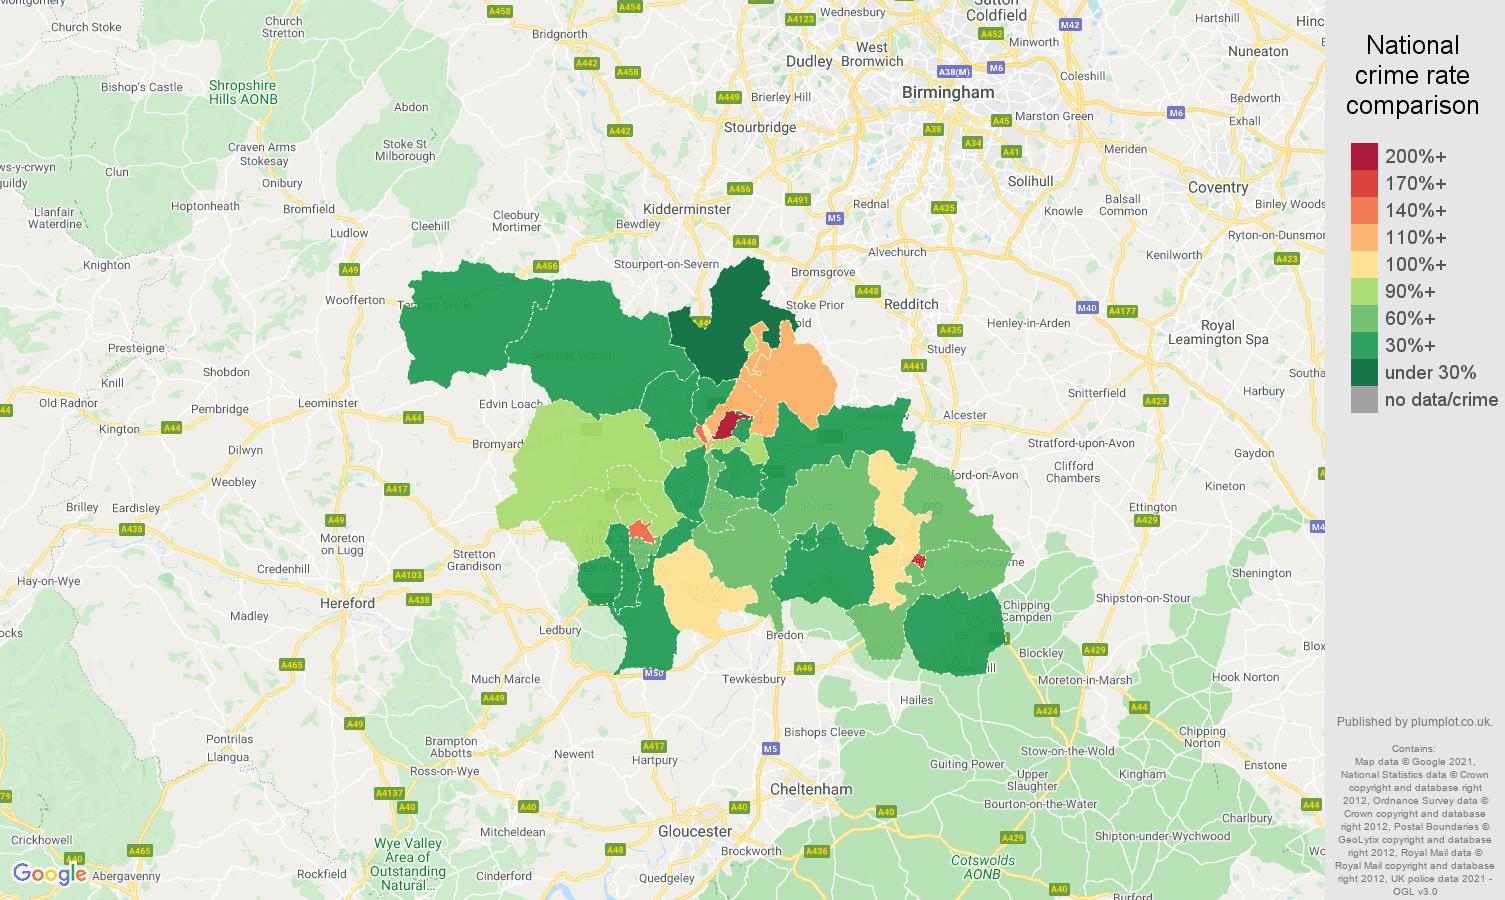 Worcester criminal damage and arson crime rate comparison map